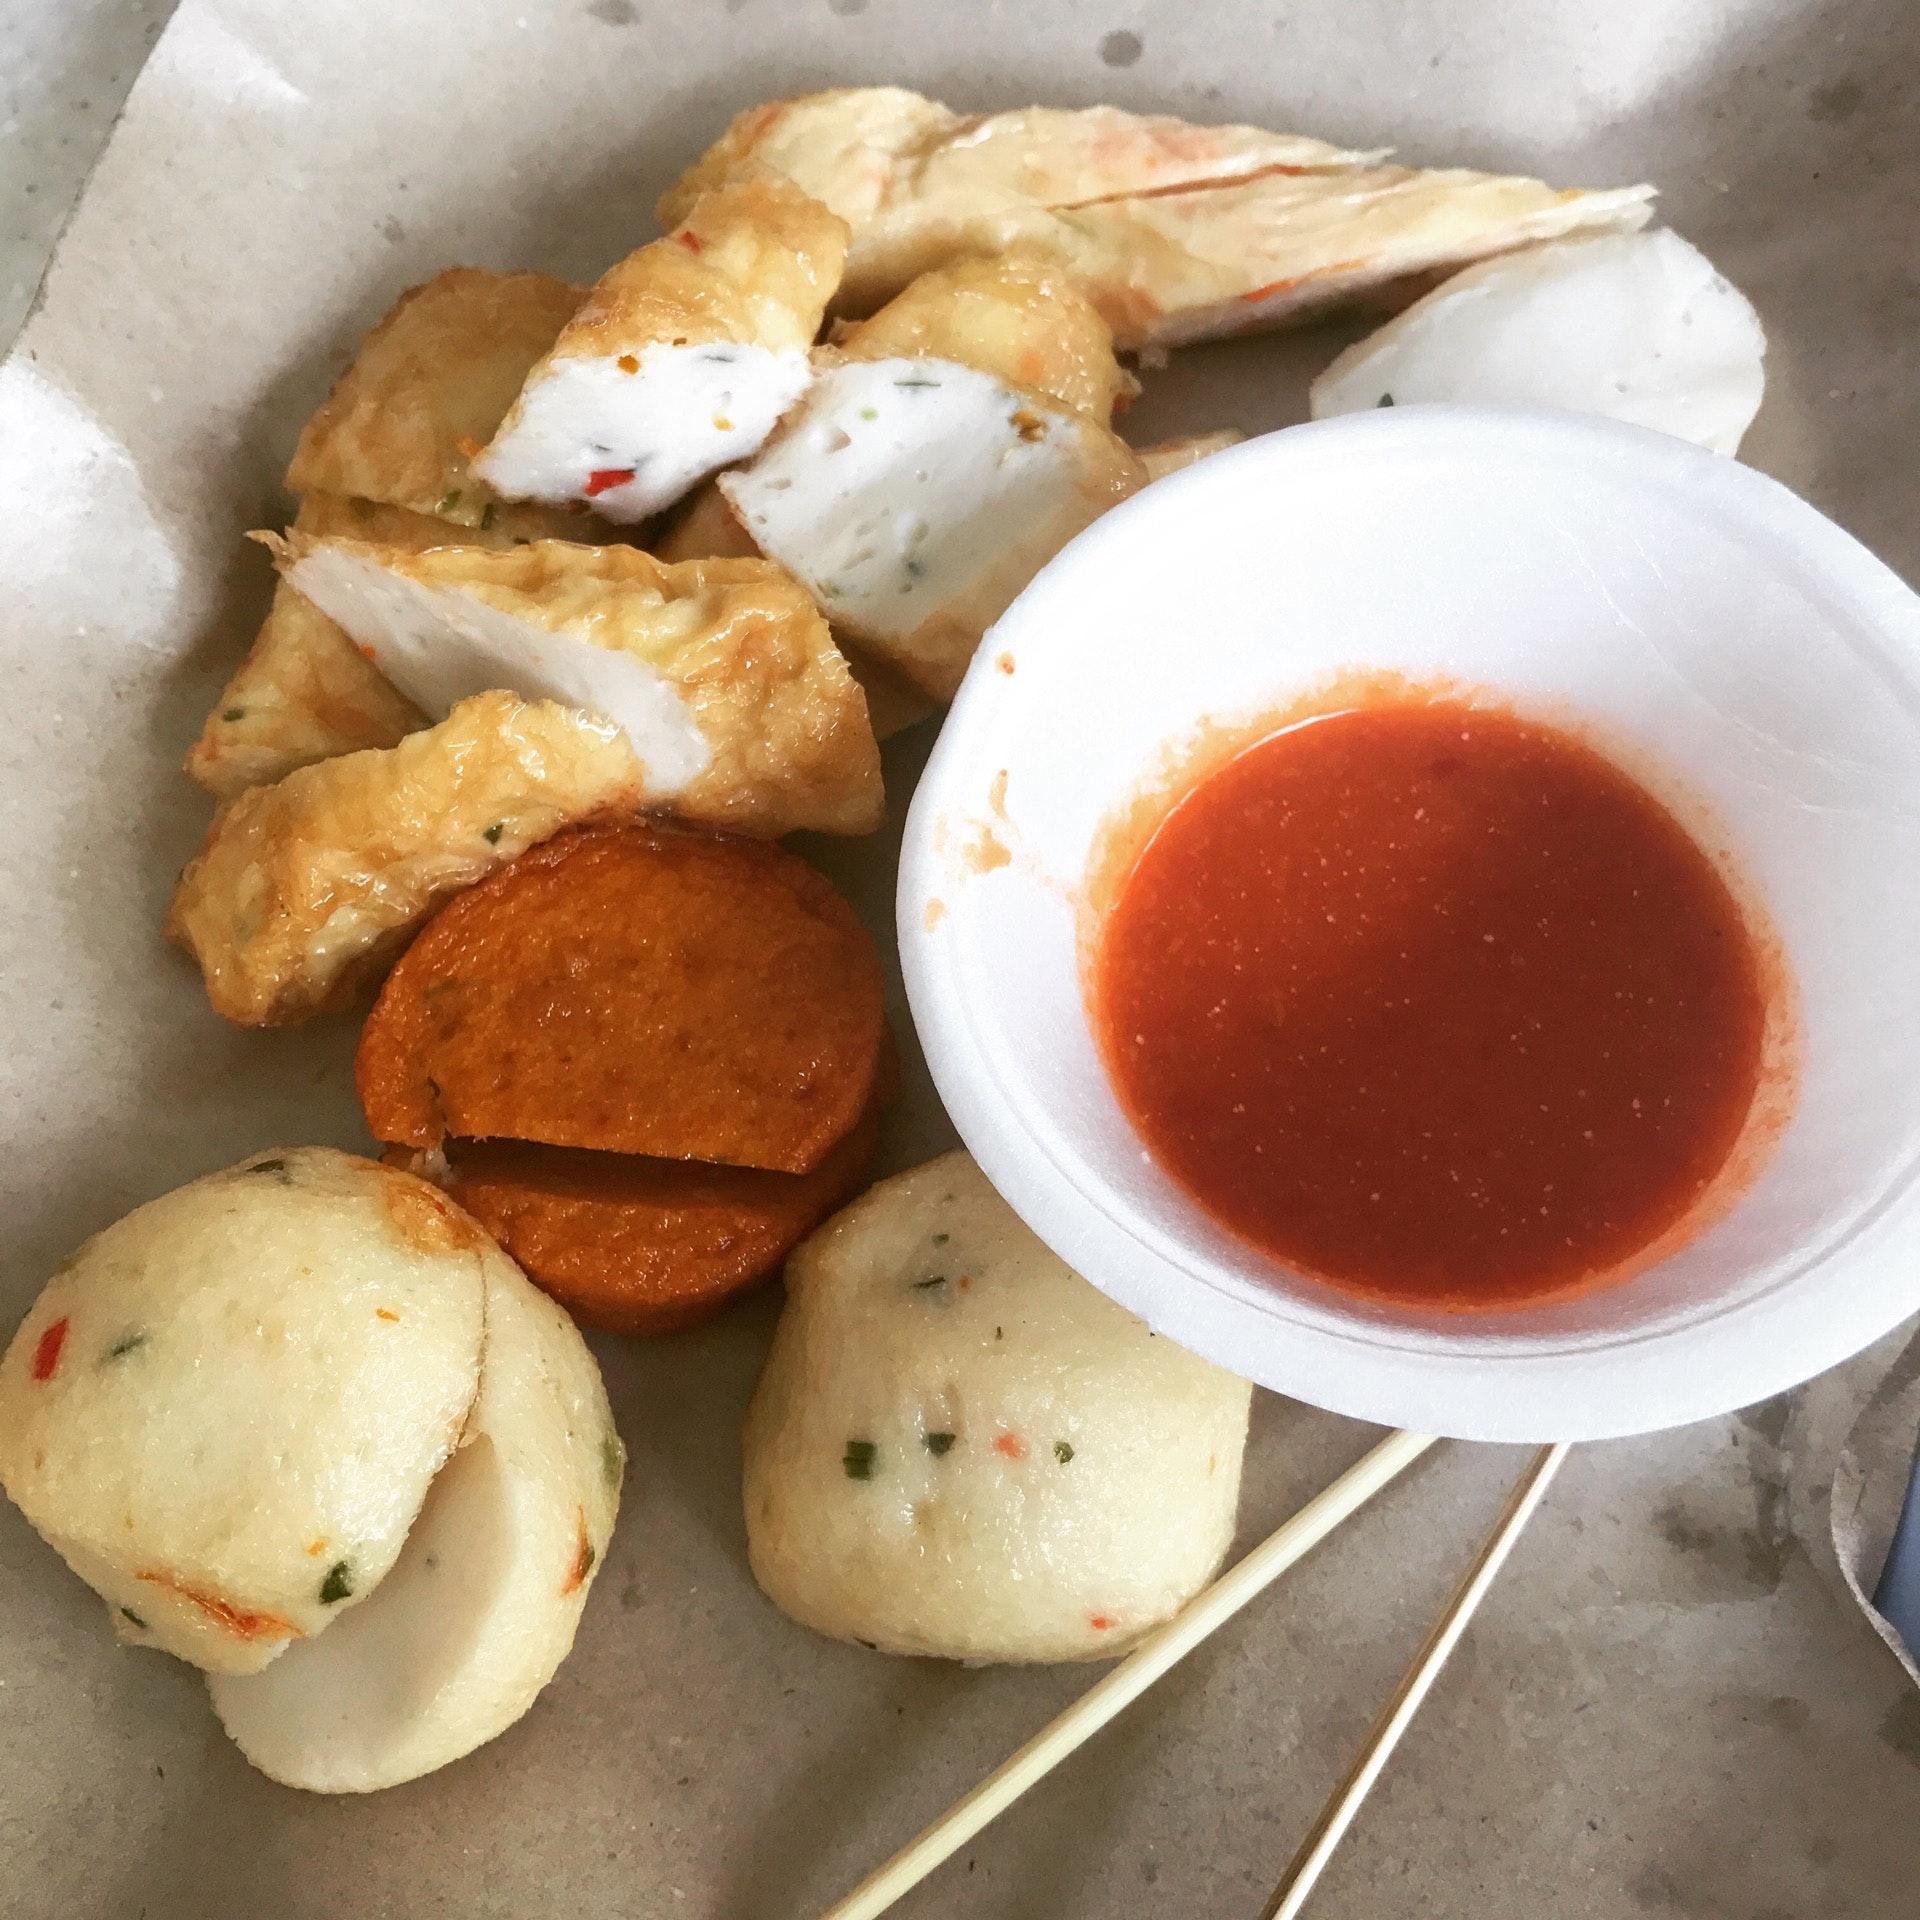 Tiong Bahru Fishball (Tiong Bahru Market)